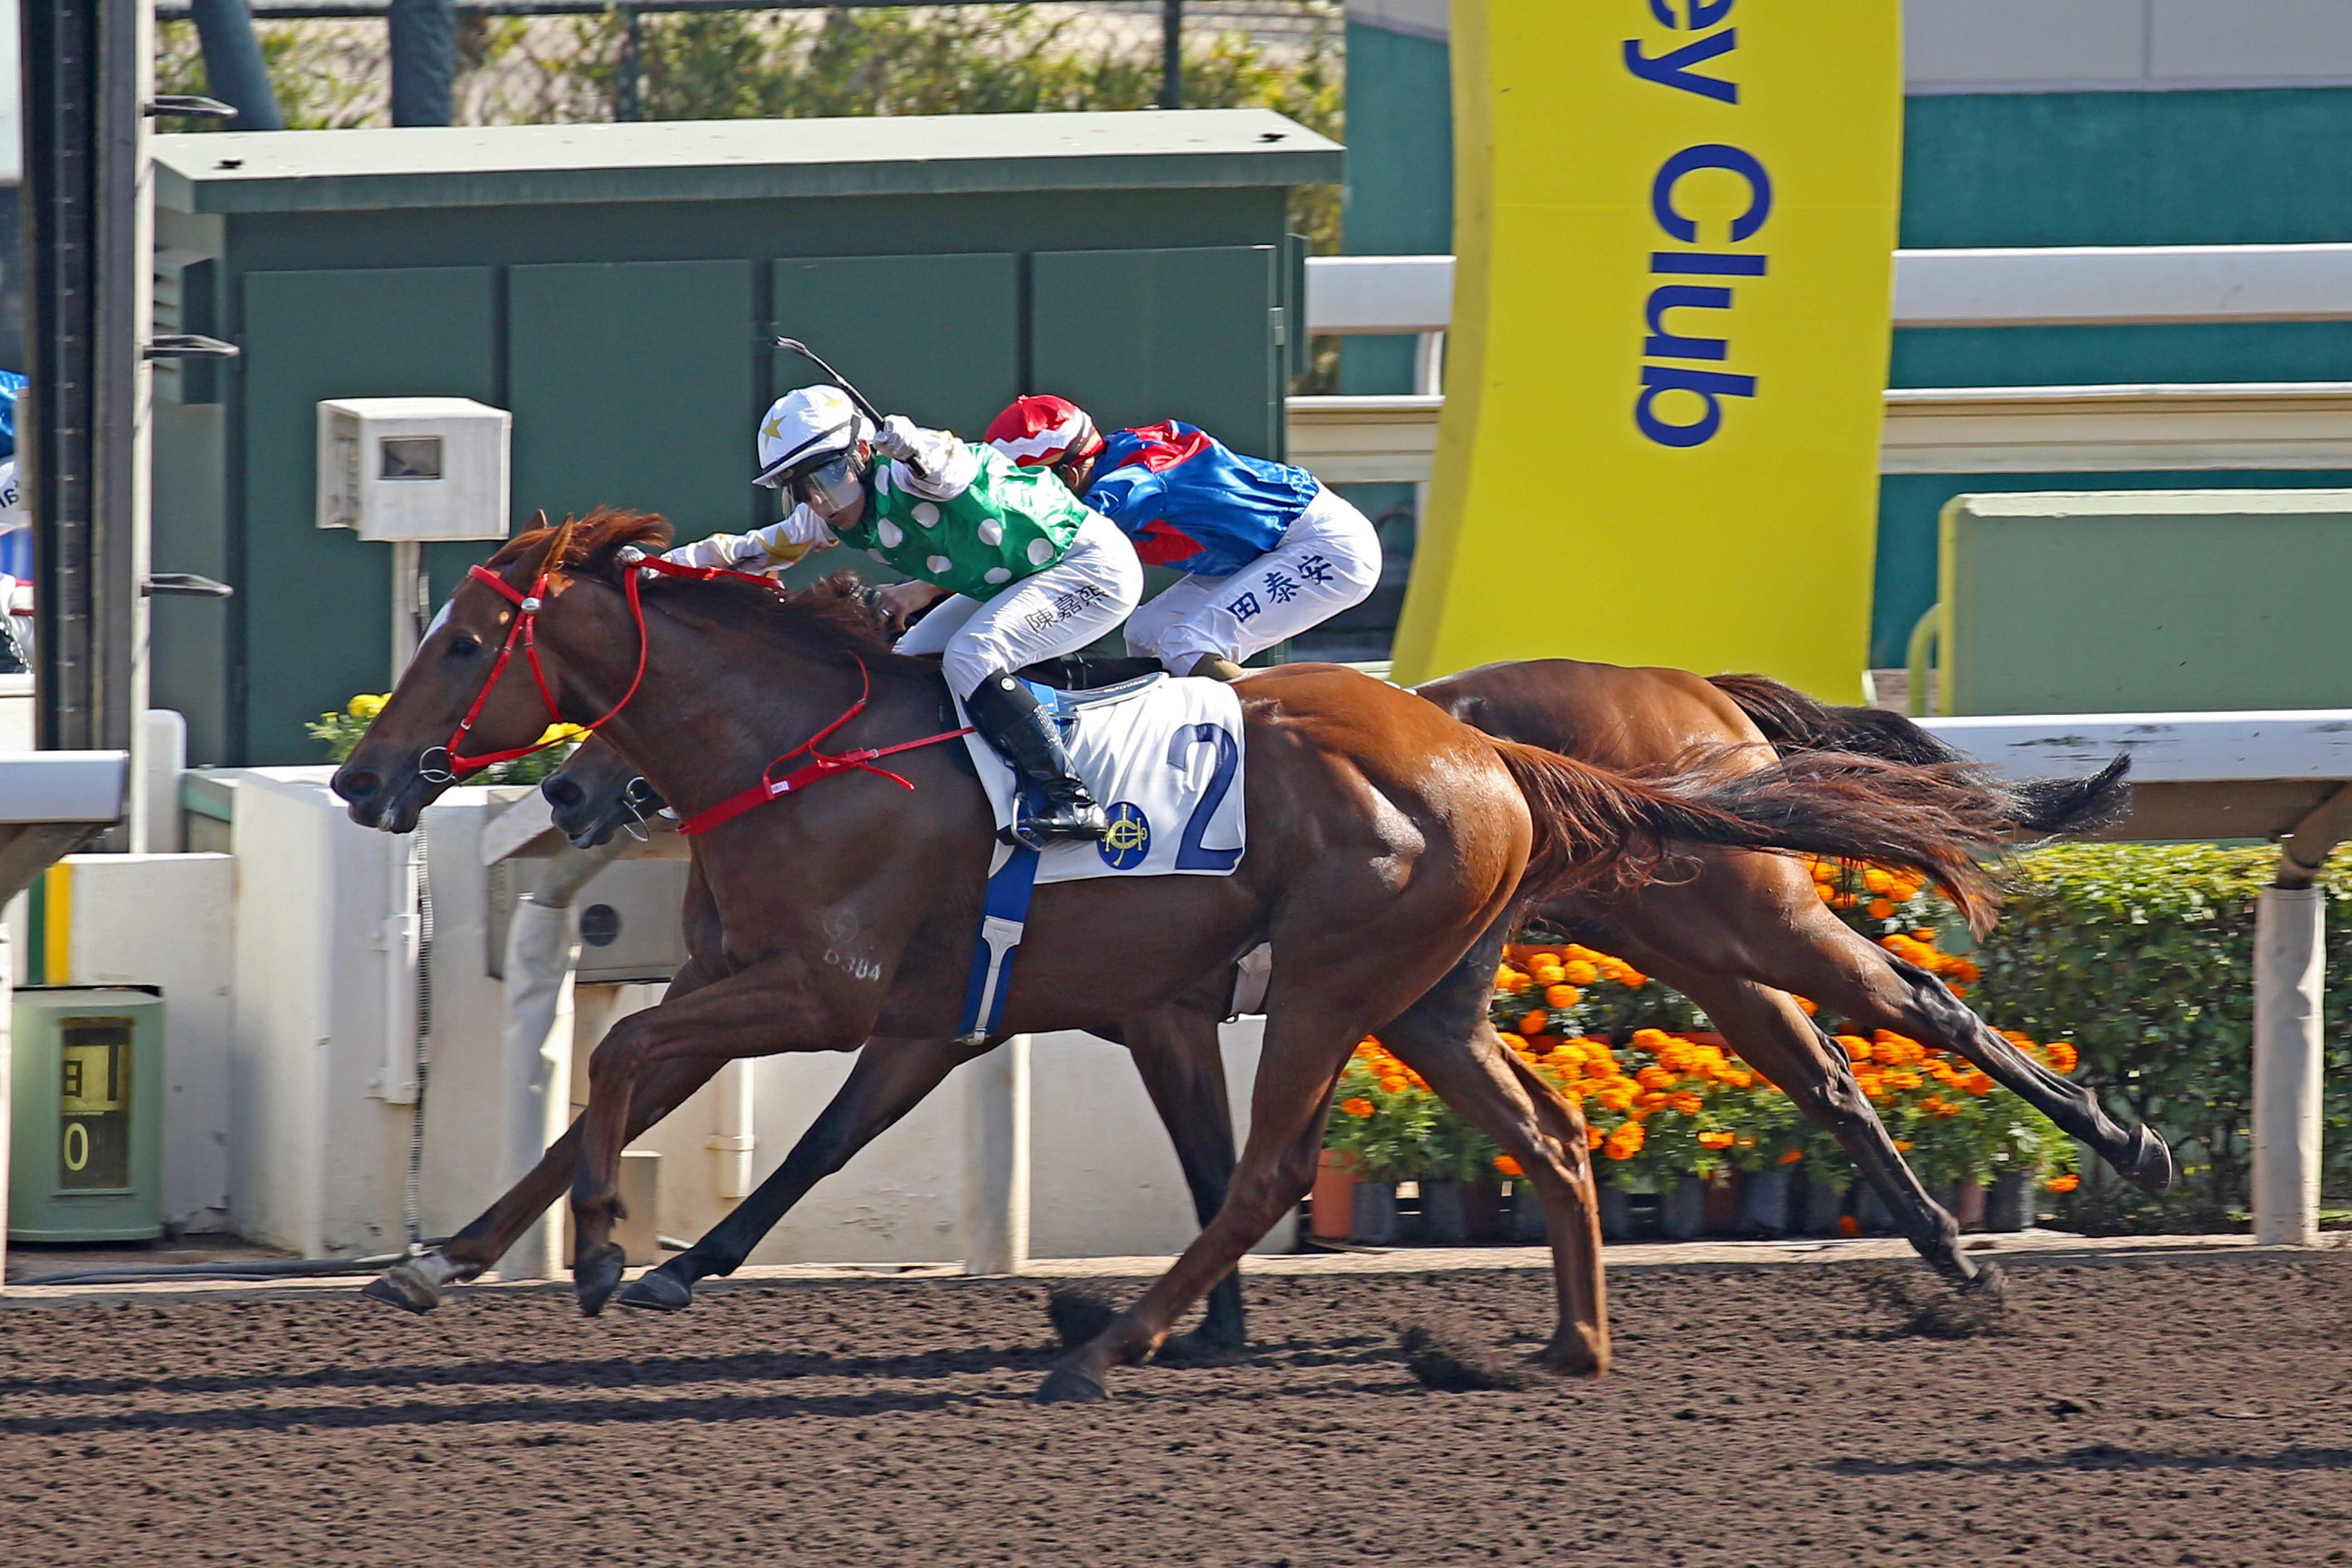 harvest moon 64 horse race betting 101